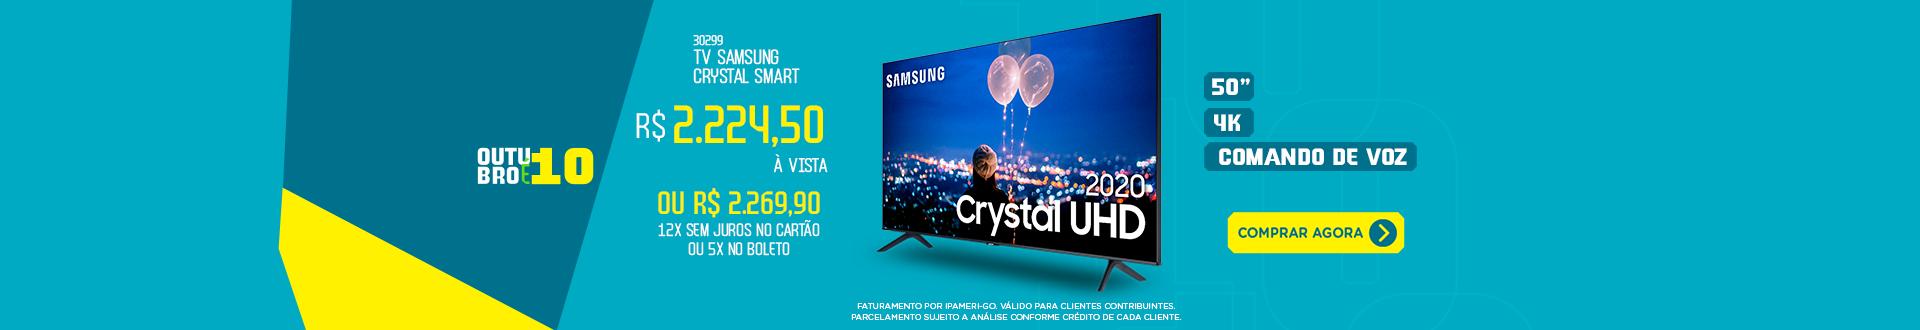 Outubro 10 - TV Samsung Crystal 50p